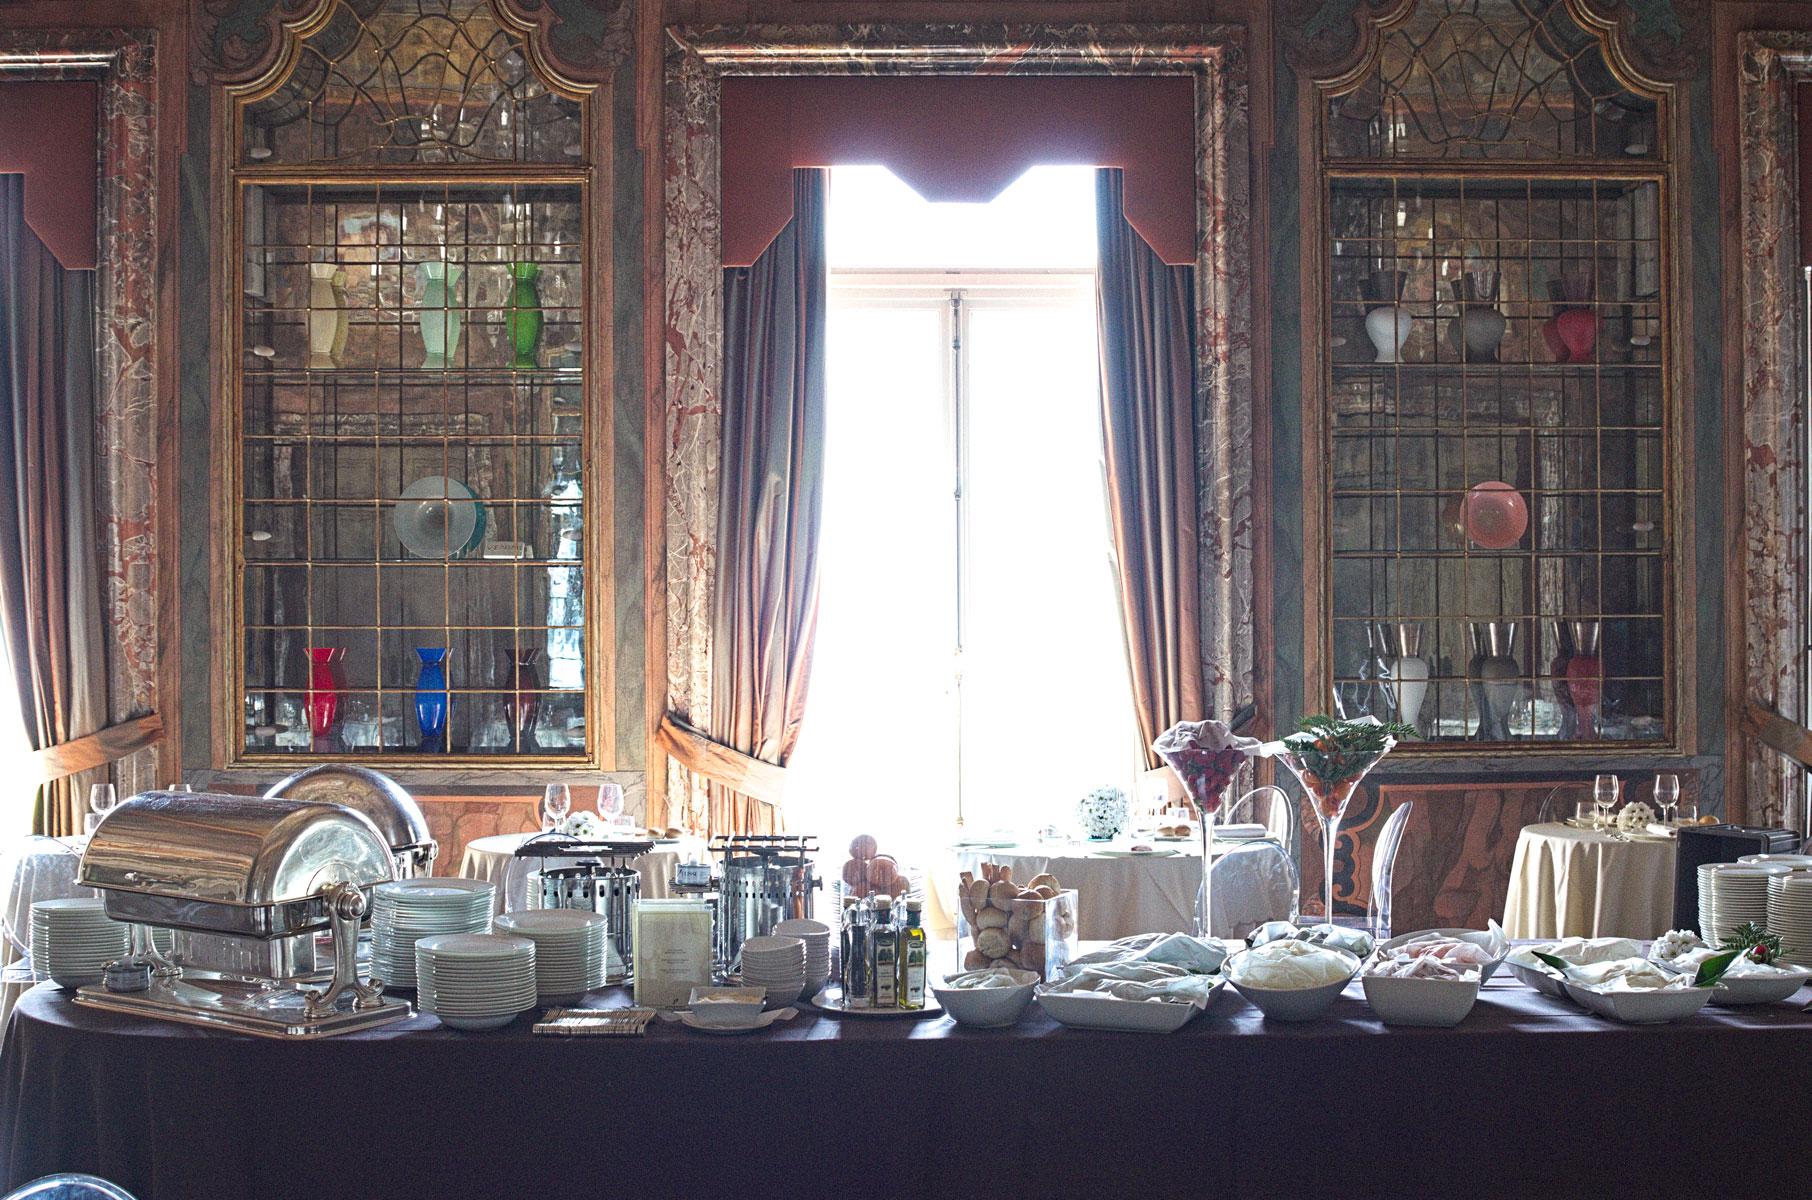 Villa Erbe photographed by Ian Lea Photography